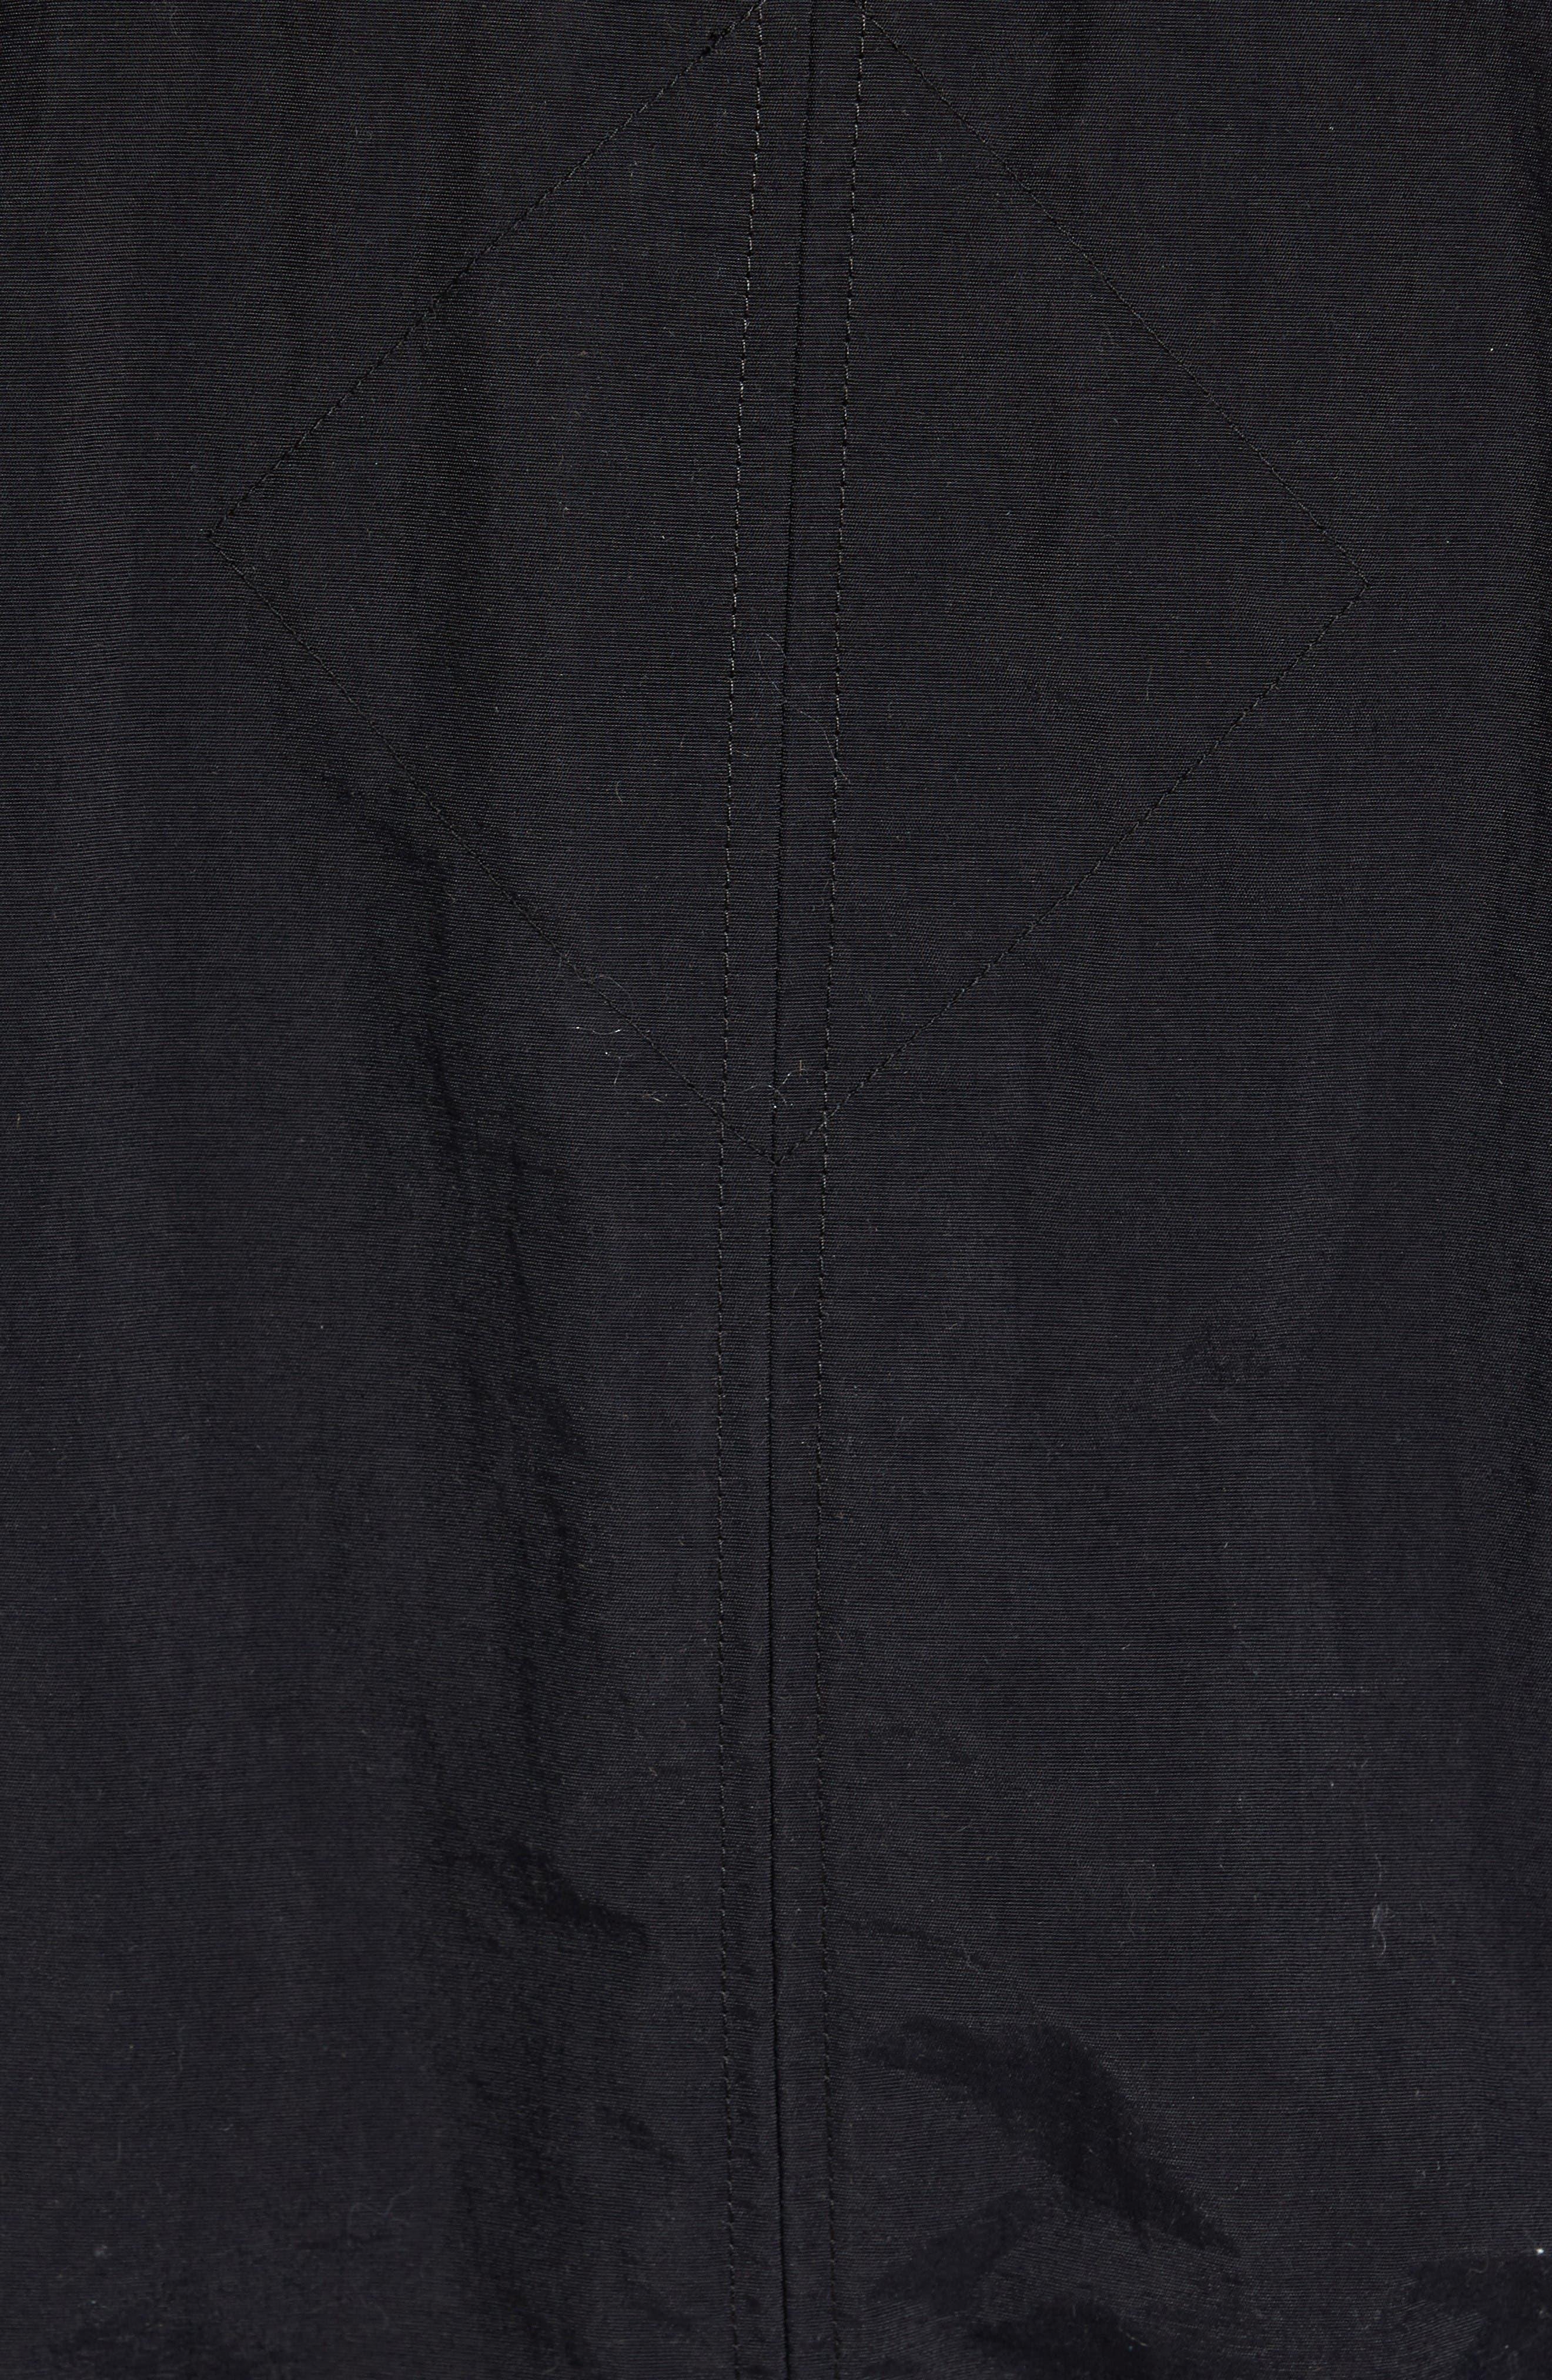 Faber Bomber Jacket,                             Alternate thumbnail 5, color,                             Black